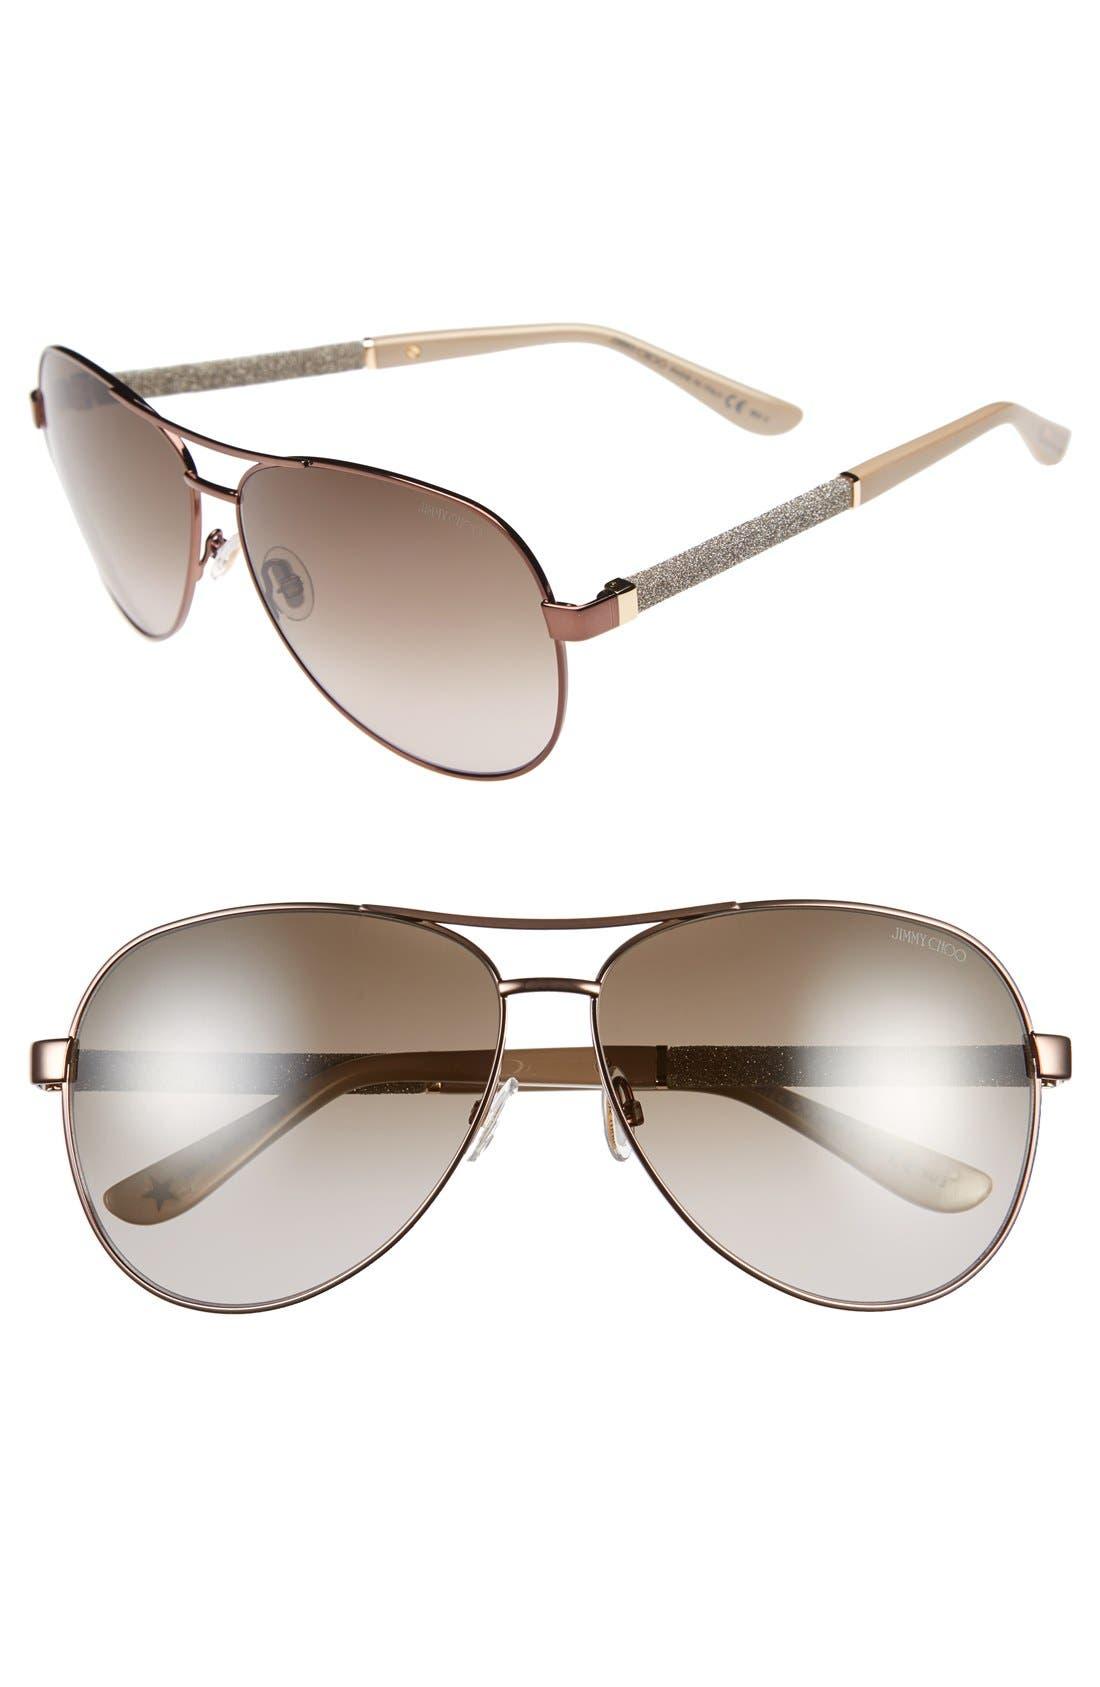 61mm Aviator Sunglasses,                             Main thumbnail 1, color,